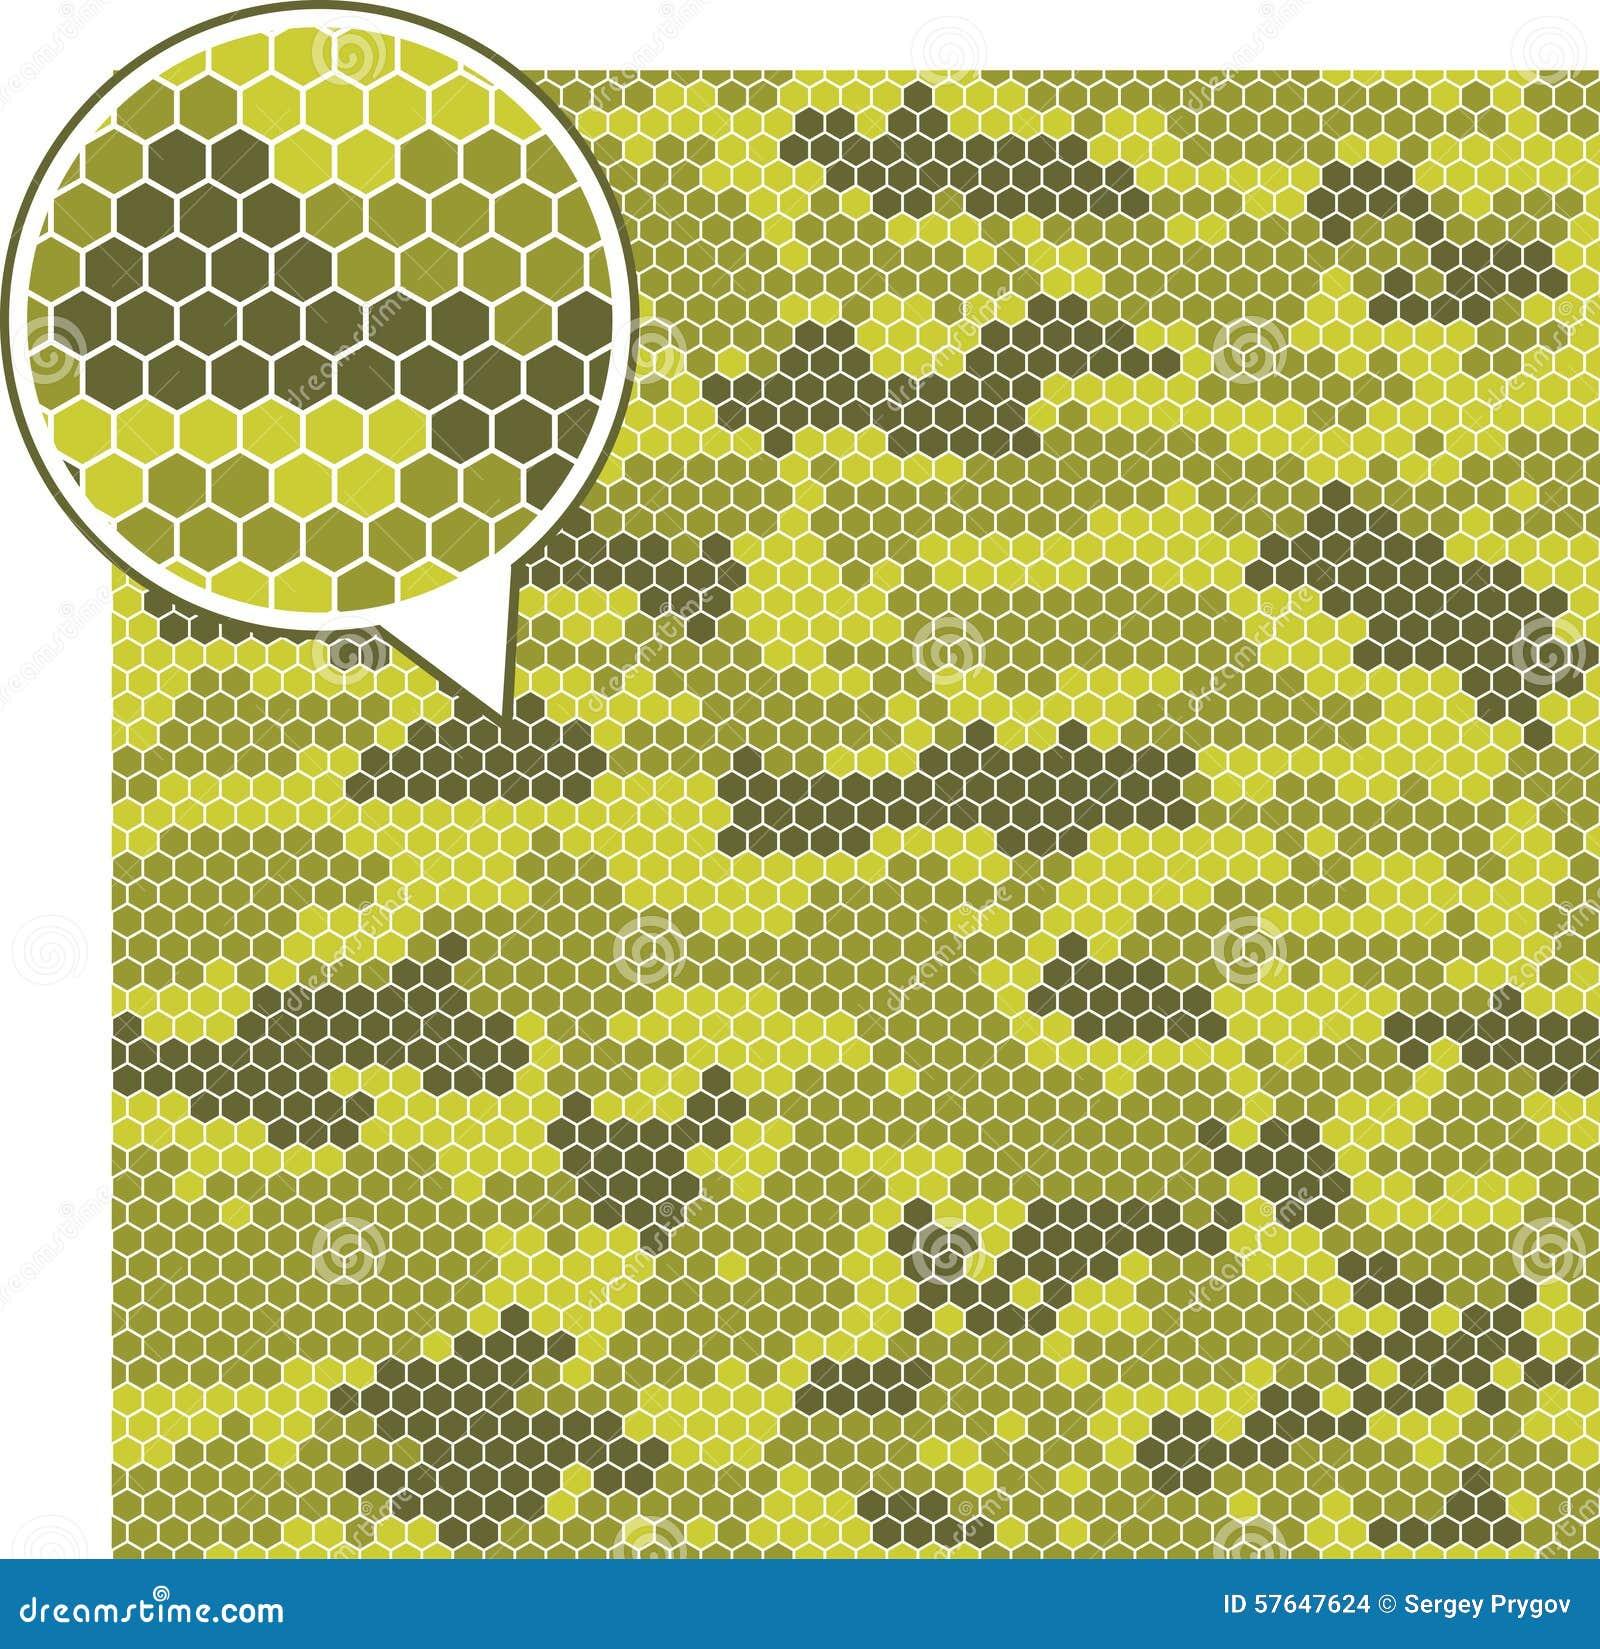 Digitale camouflage naadloze patronen